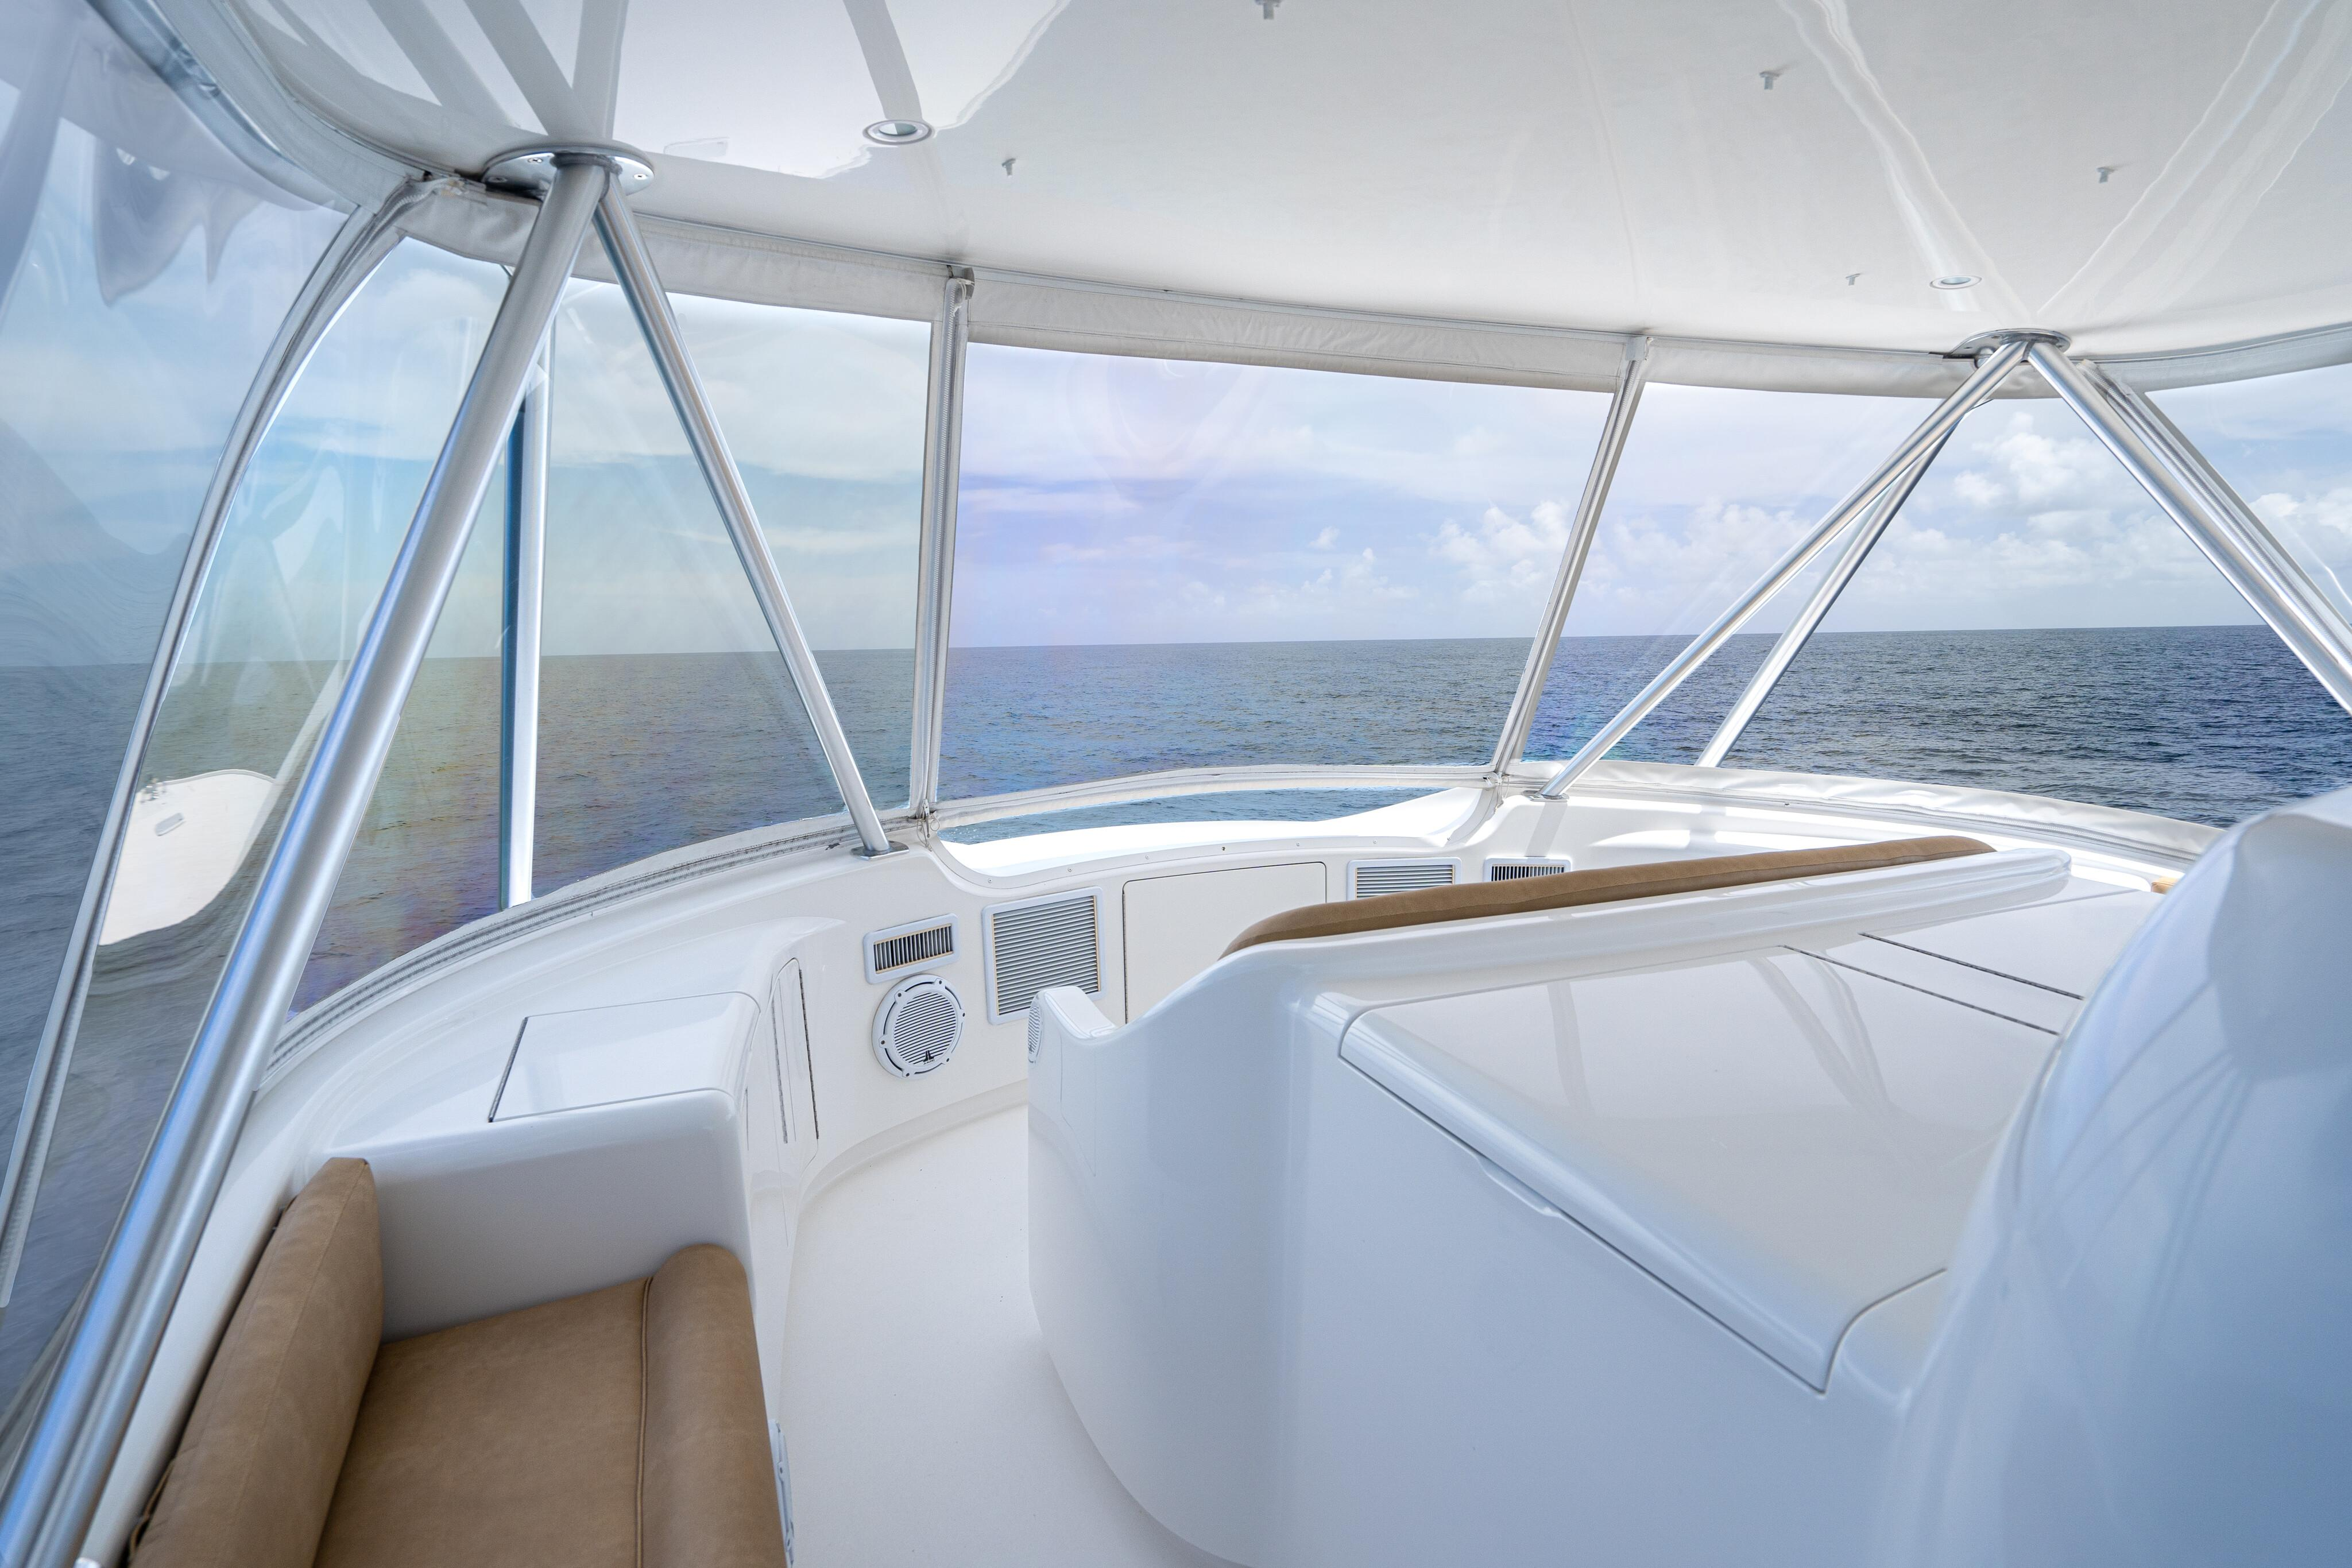 2012 76 Viking SF - Flybridge